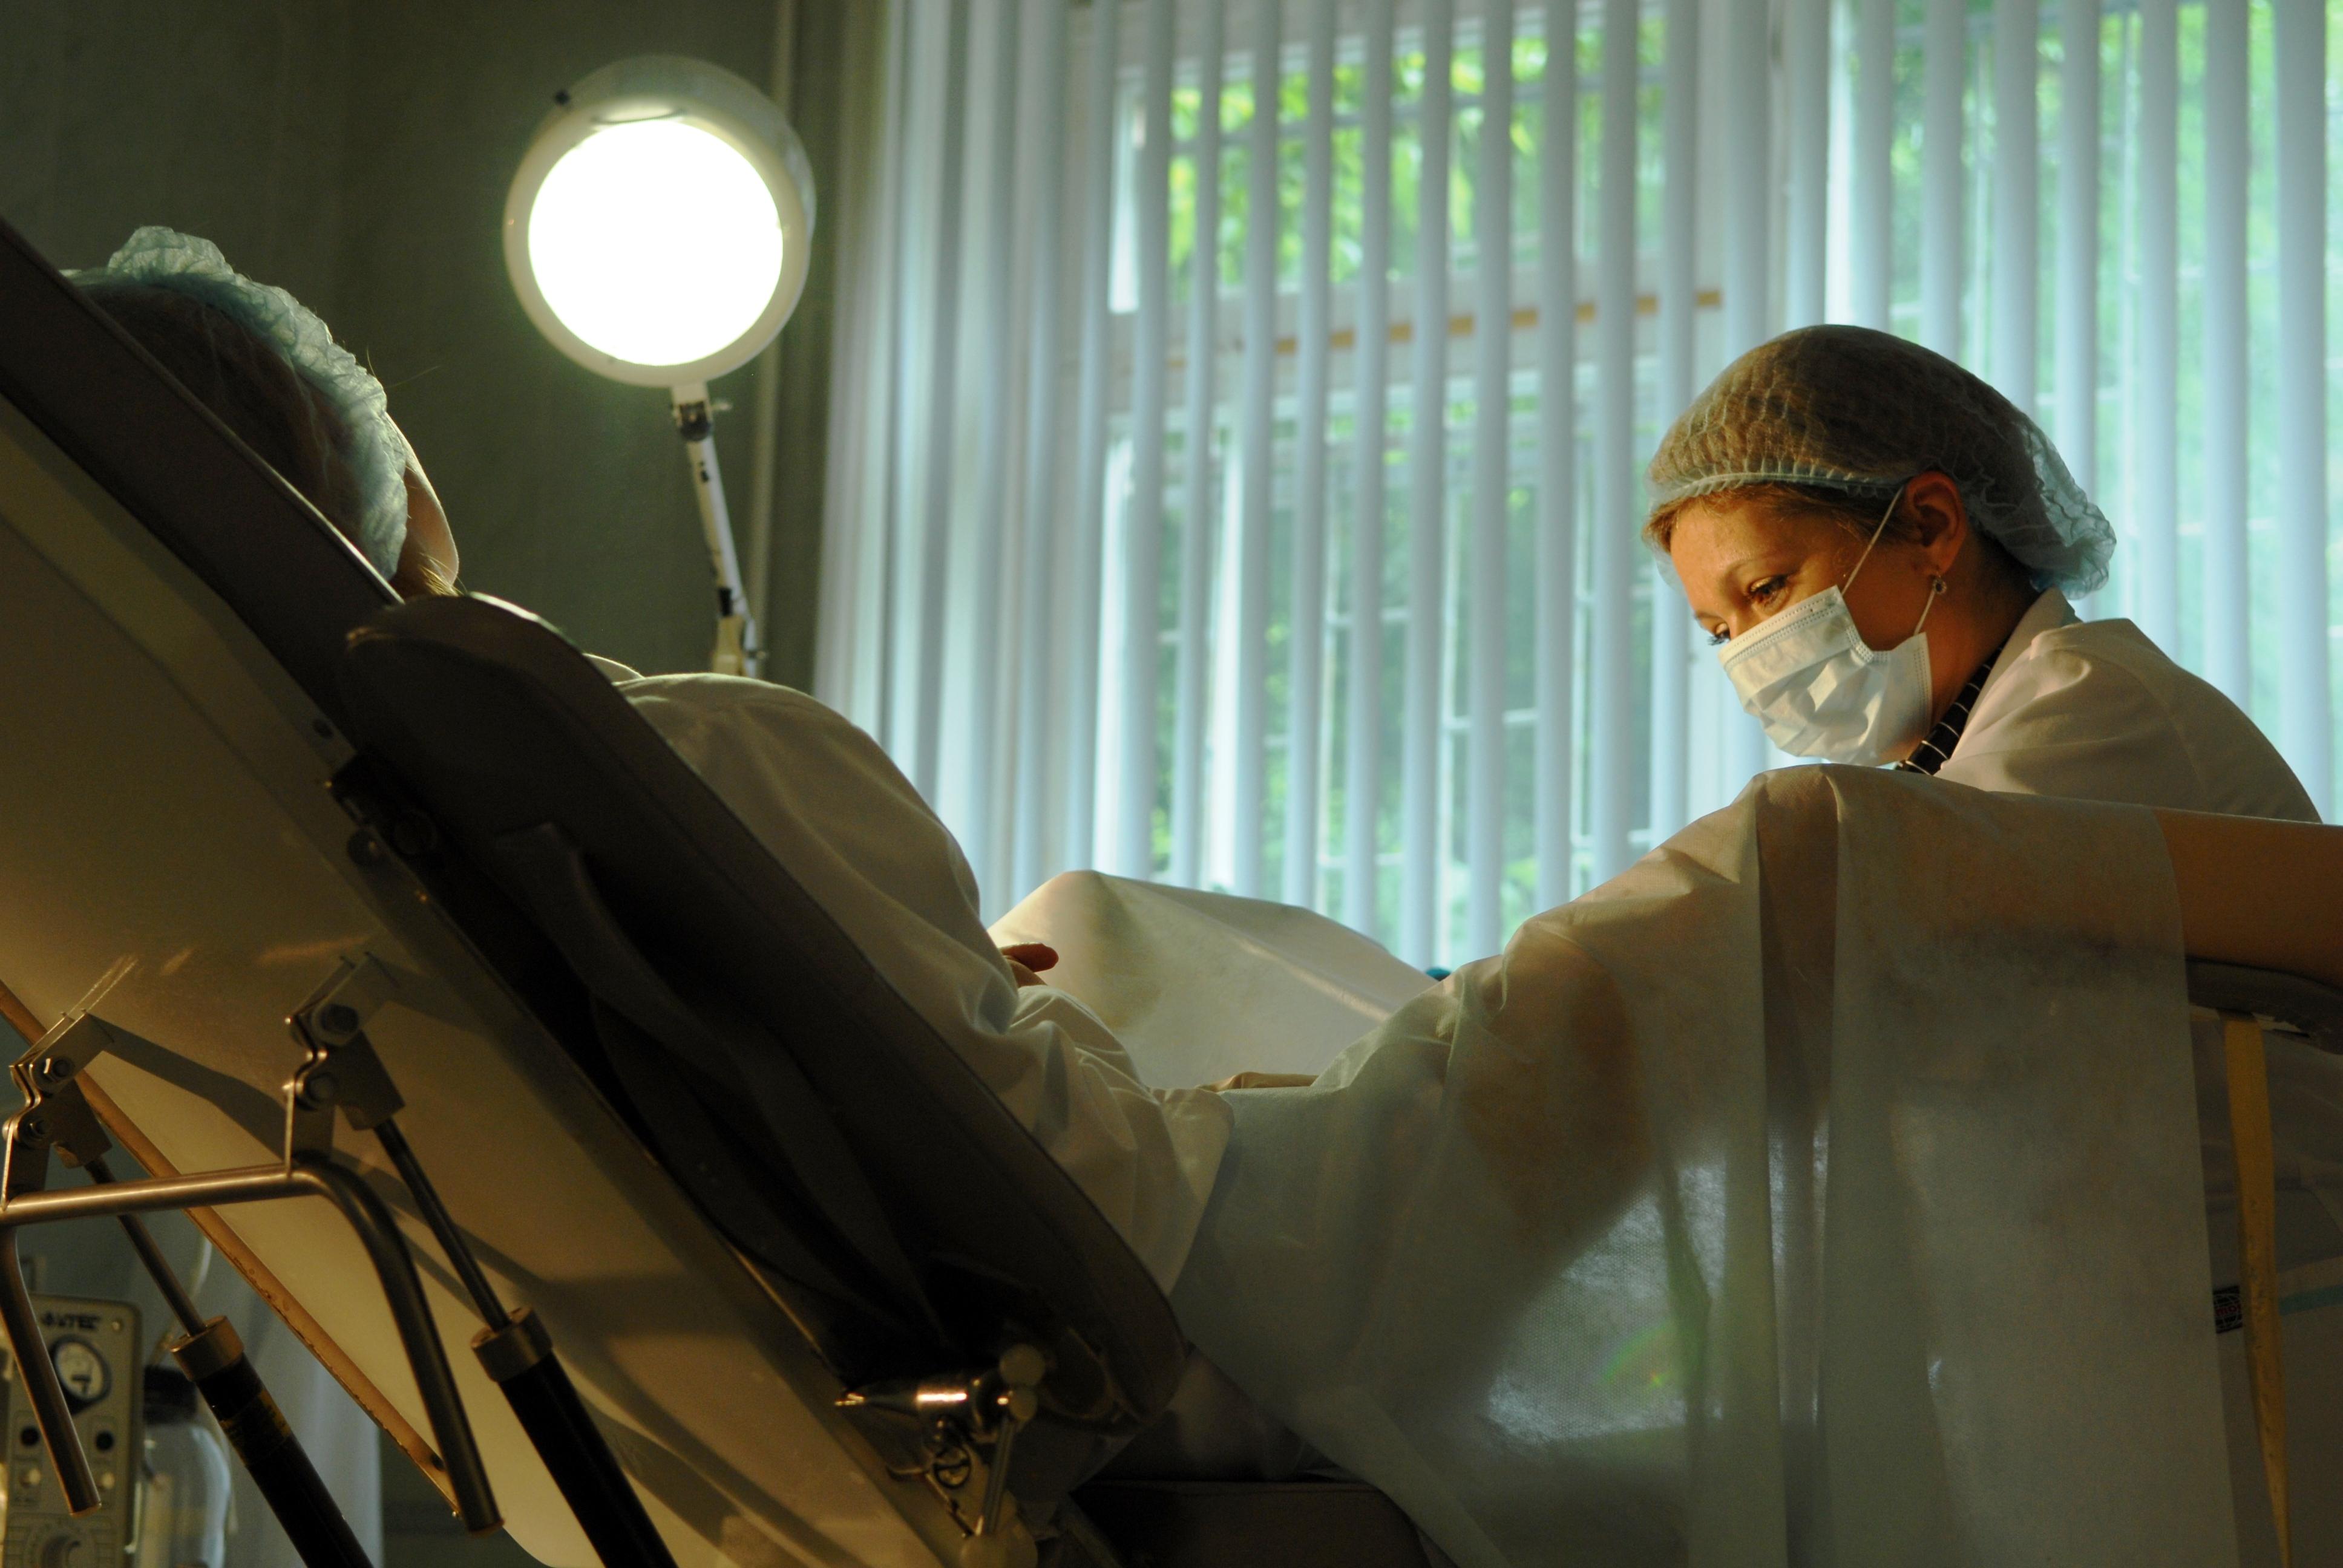 Рак матки симптомы и признаки при климаксе